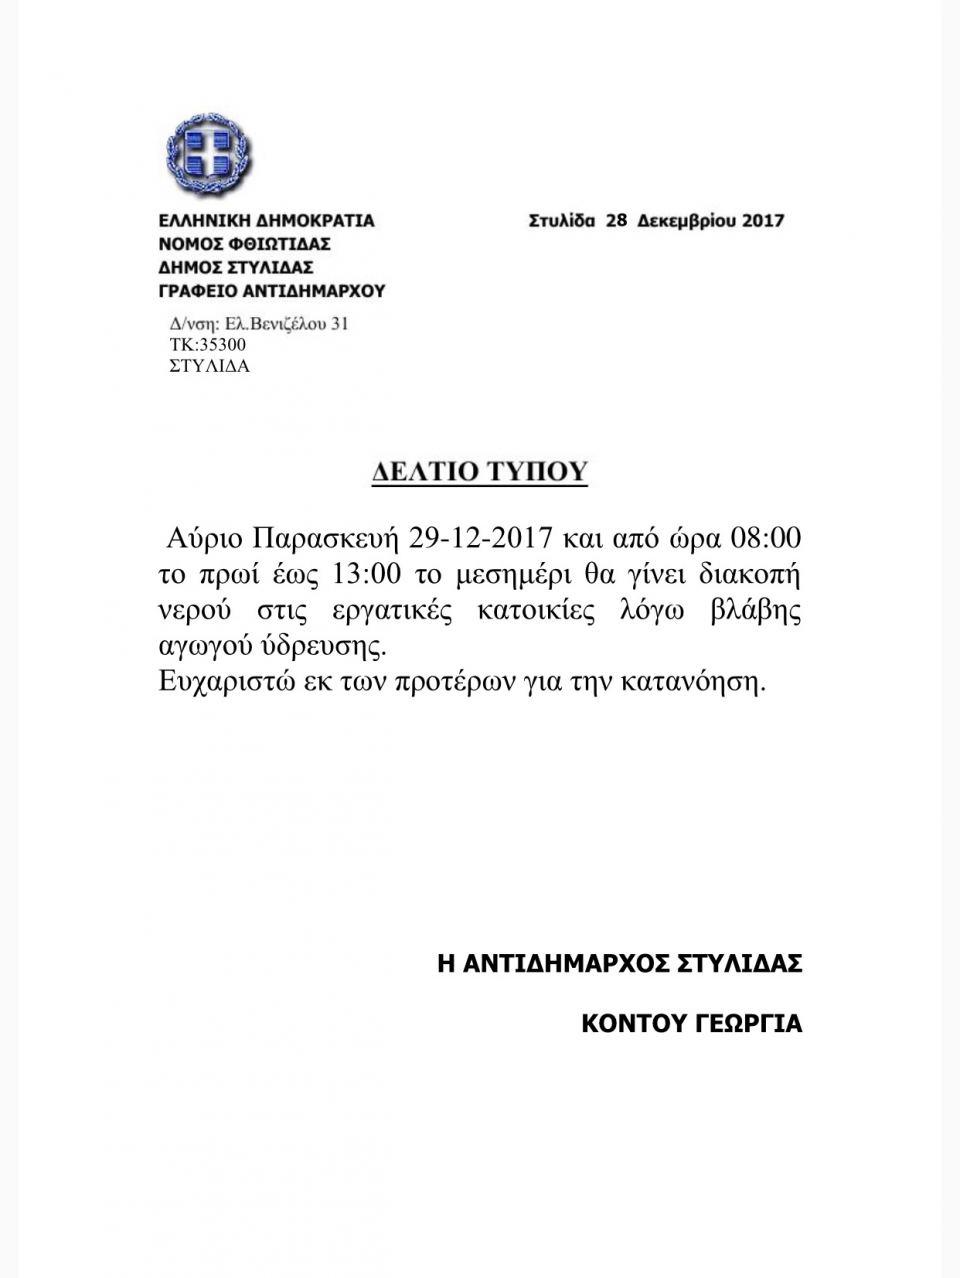 img 7182 ΣΤΥΛΙΔΑ Νερο ΔΙΑΚΟΠΗ ΝΕΡΟΥ